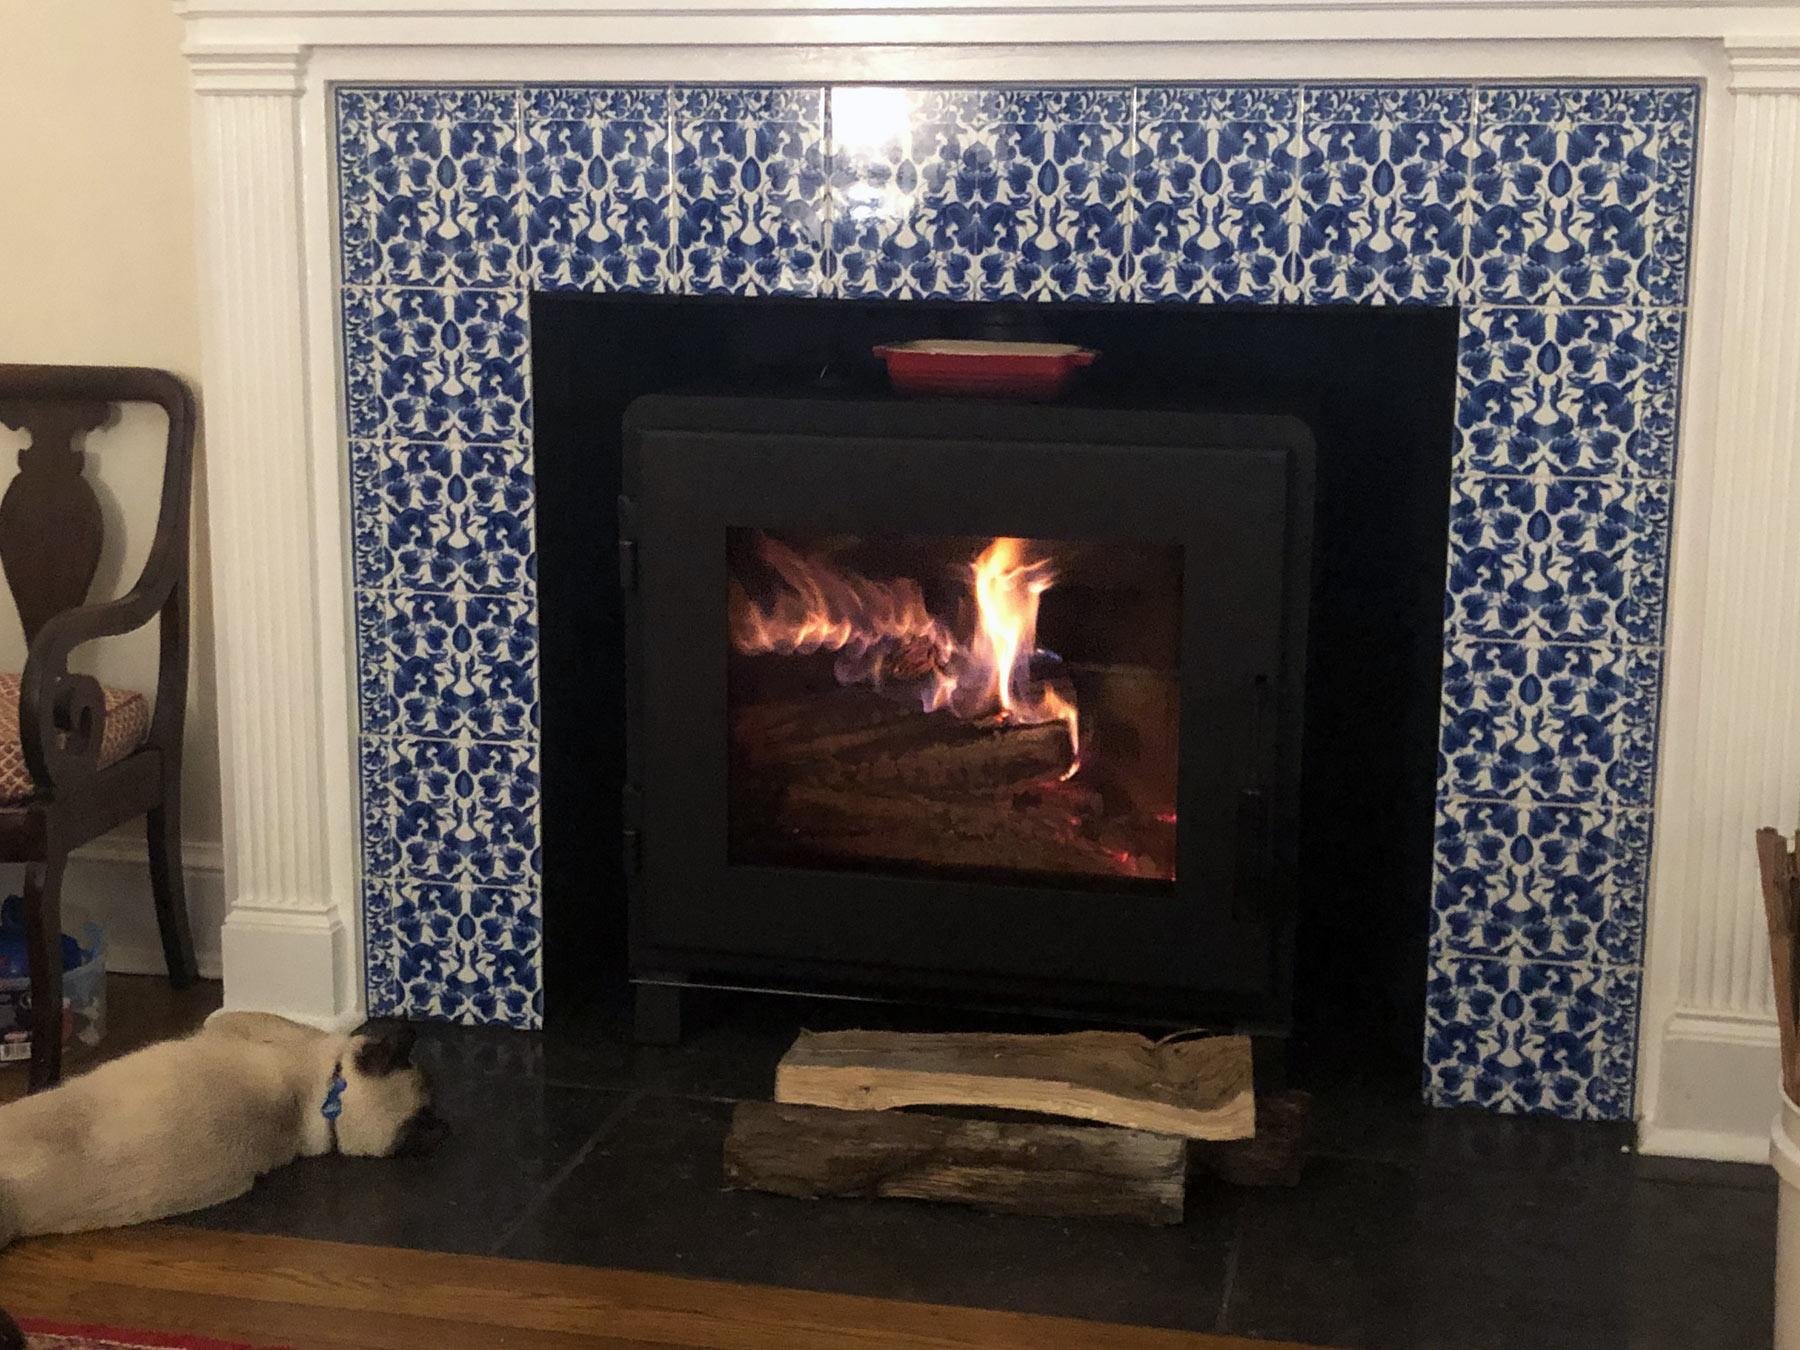 De Morgan fireplace surround with Art Nouveau Ducks and Dragons fireplace, Victorian Blue